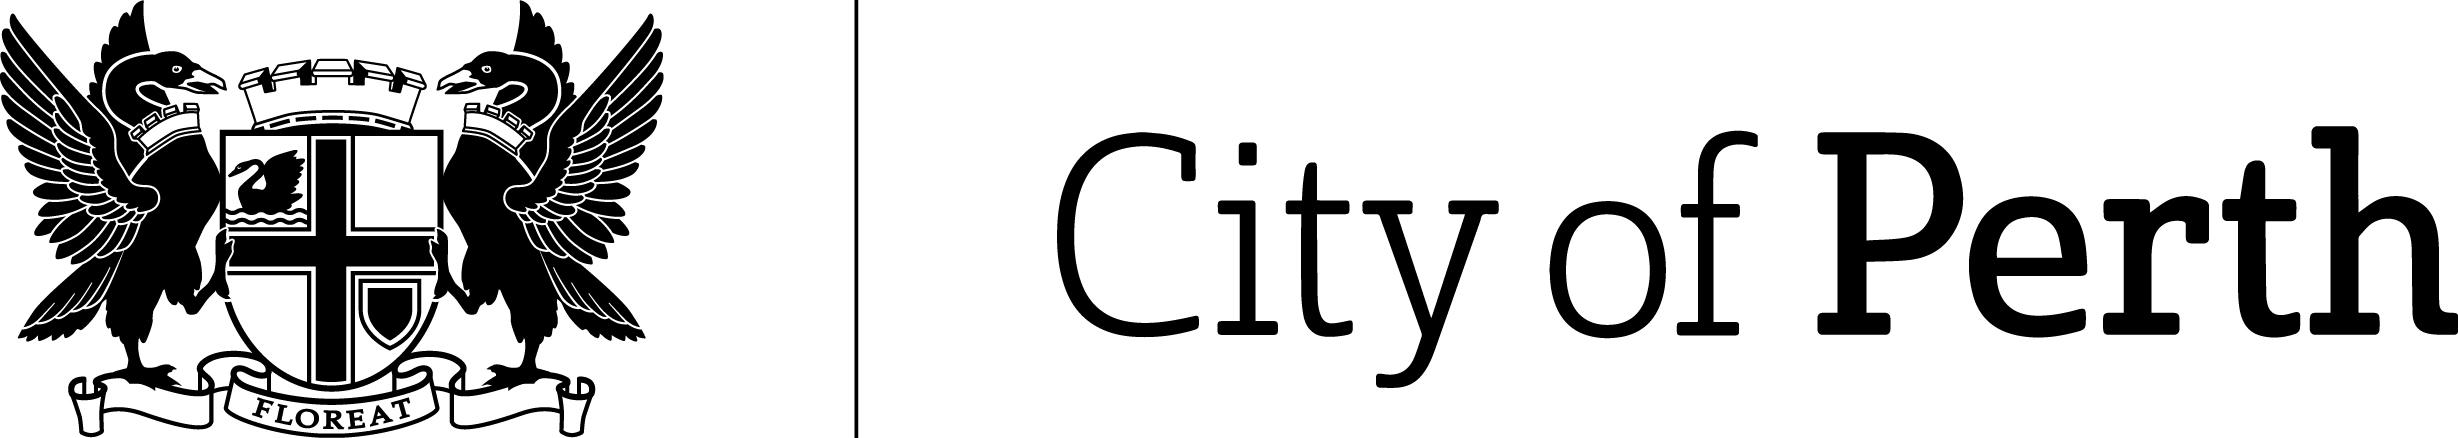 City of Perth logo Horizontal_MONO (3).jpg